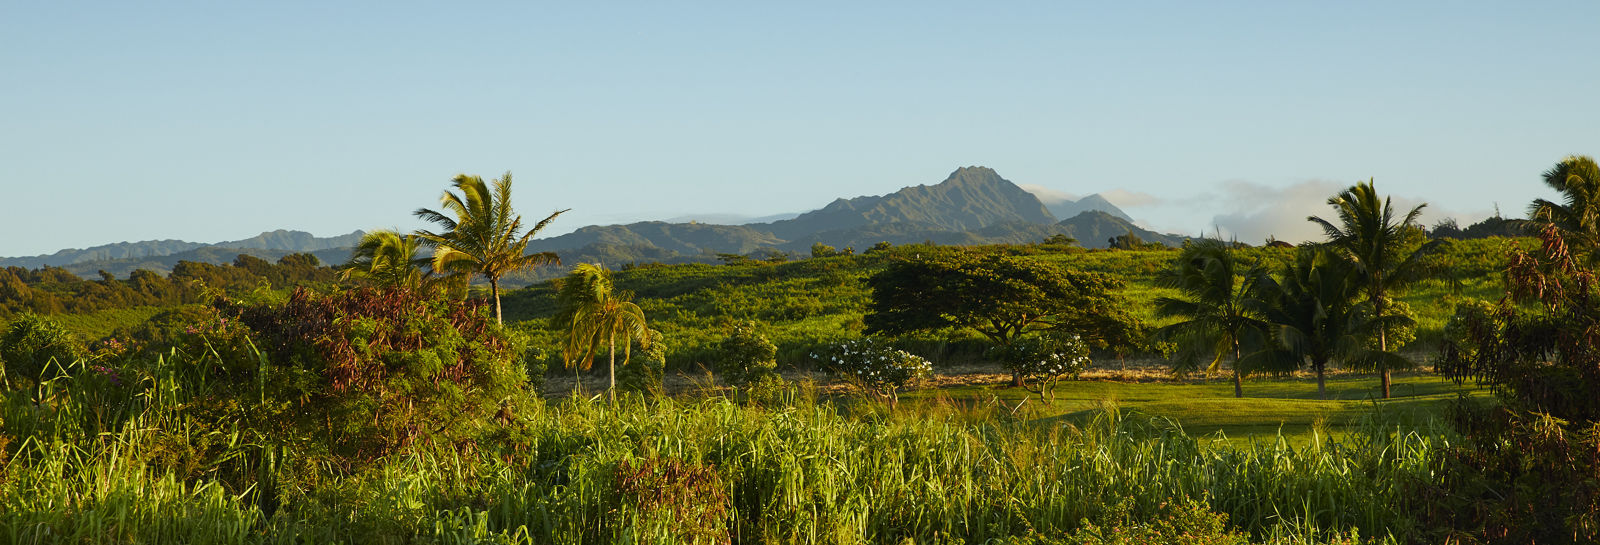 Kauai mountain view